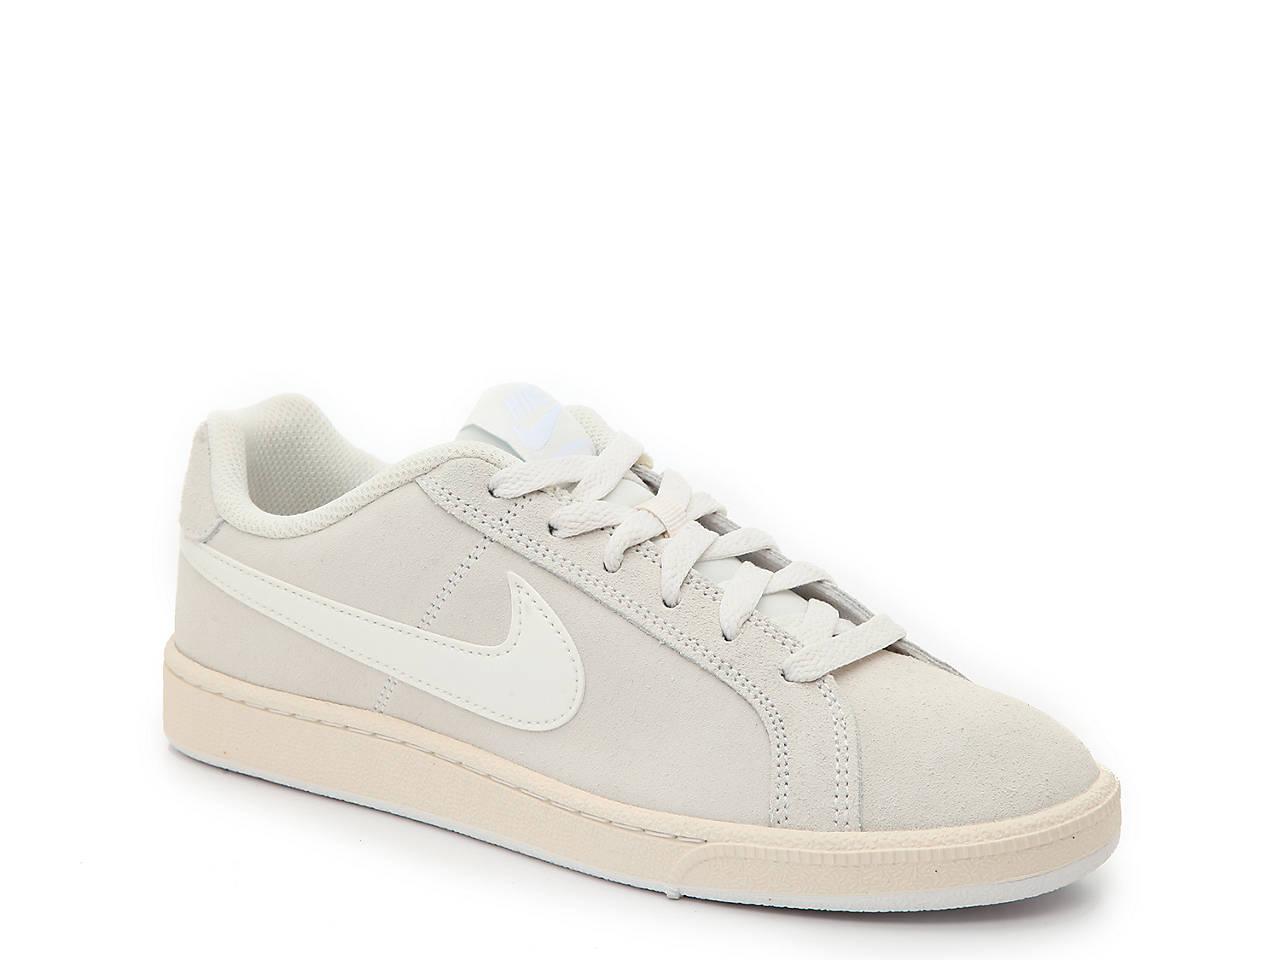 separation shoes fbfd3 65126 Nike. Court Royale Sneaker - Women s